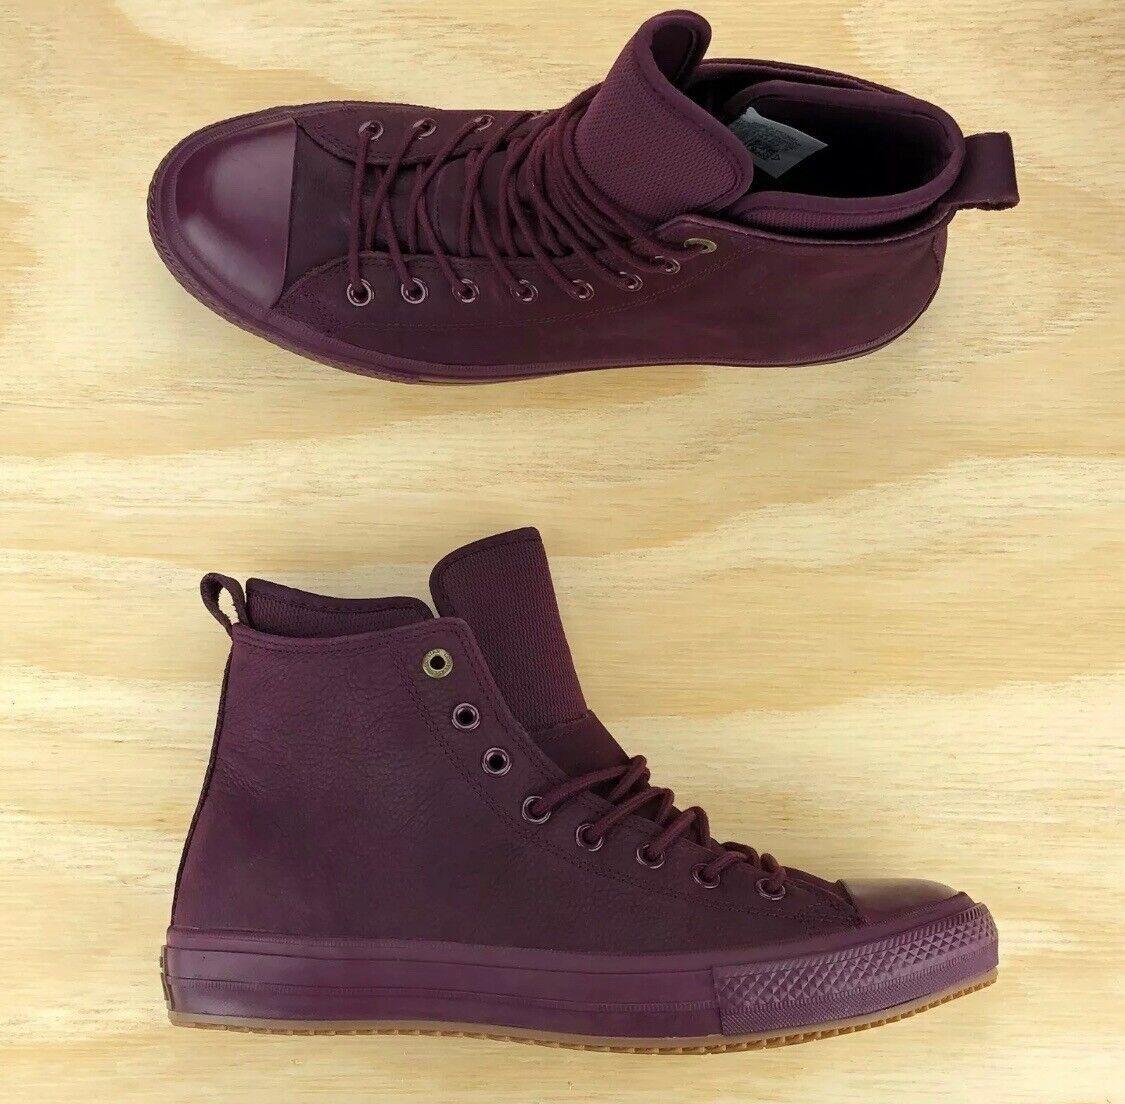 Converse Chuck Taylor All Star WP Boot Hi Top Dark Sangria Lunarlon [157458C] Mu